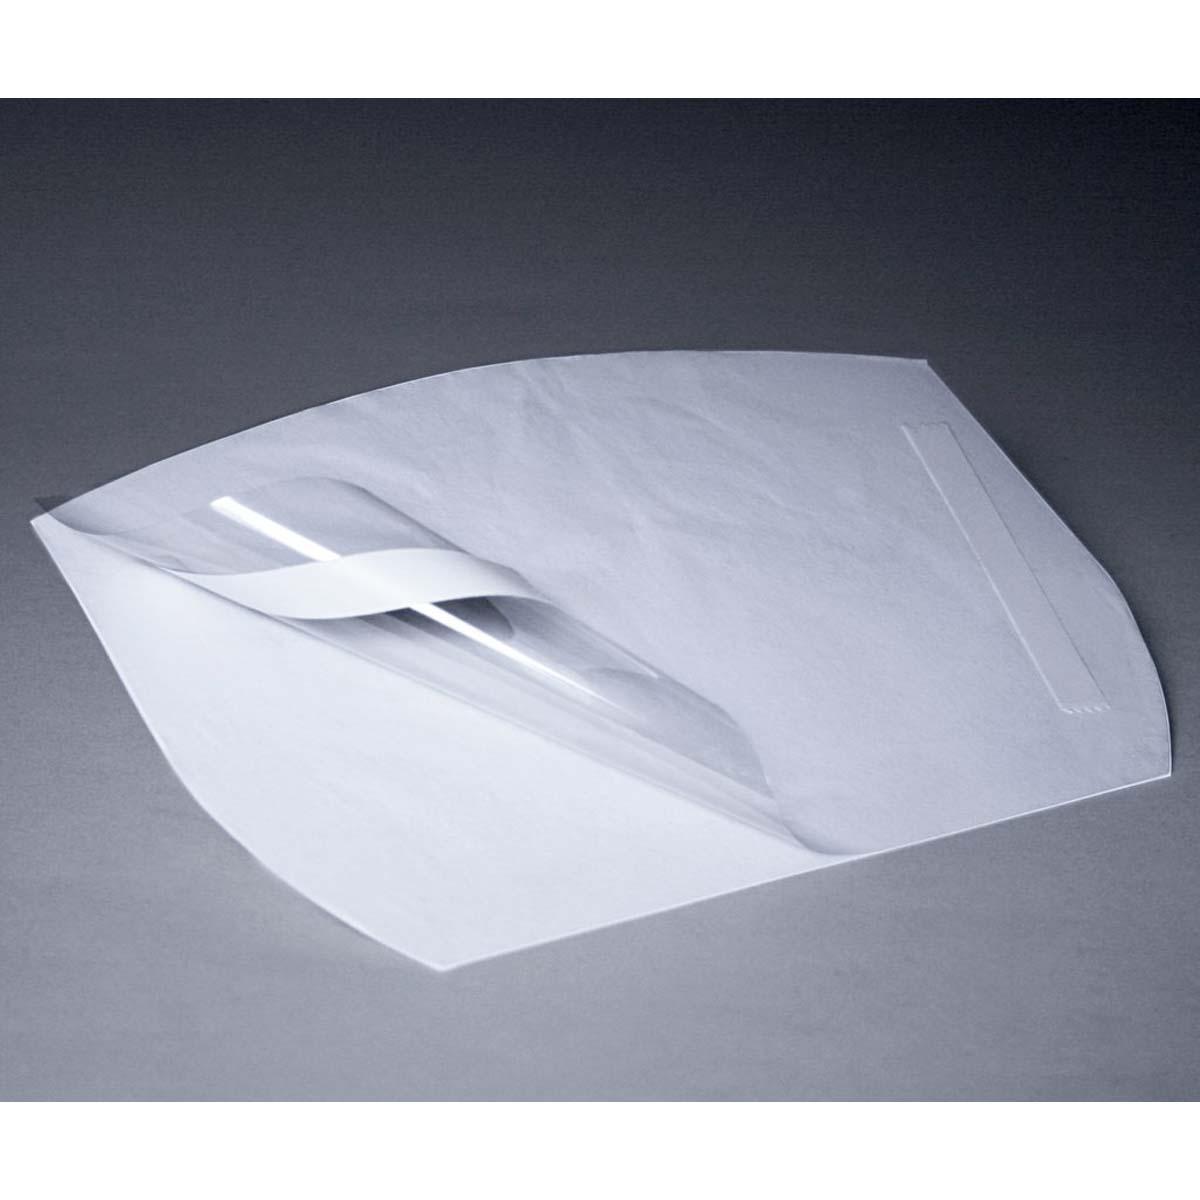 "3Mâ""¢ Versafloâ""¢ Peel-Off Visor Cover S-920L, Medium - Large, for Integrated Suspension Products"